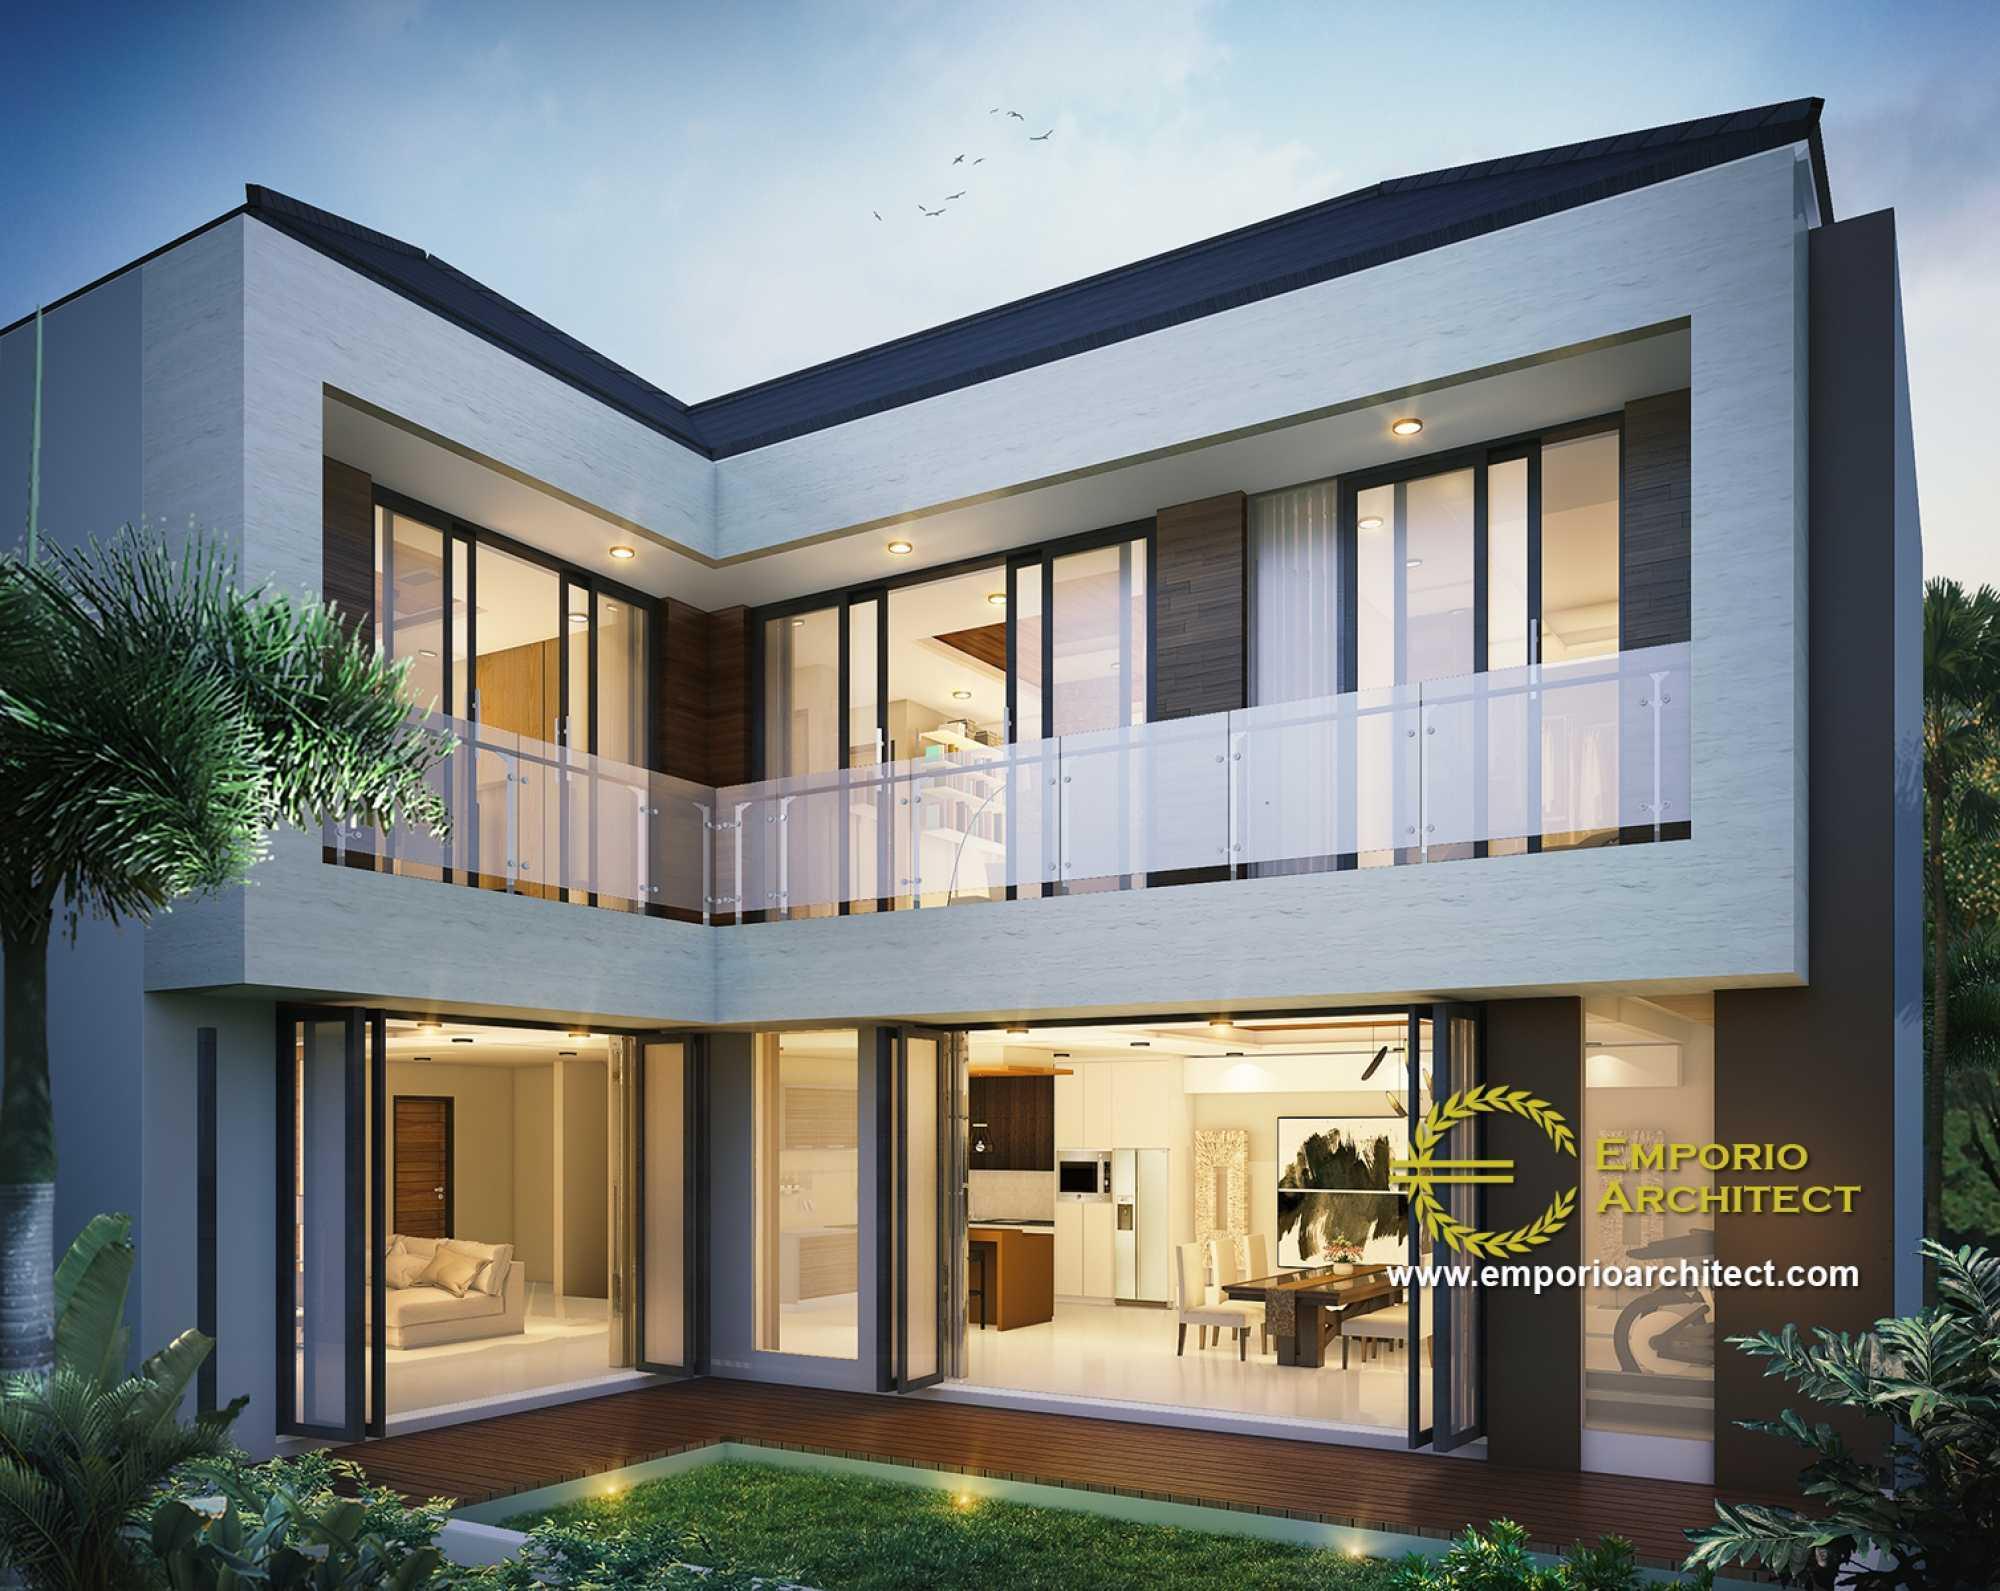 Emporio Architect Desain Rumah Modern Tropis 312 @ Bogor Bogor, Jawa Barat, Indonesia Bogor, Jawa Barat, Indonesia Emporio-Architect-Desain-Rumah-Modern-Tropis-312-Bogor  73102